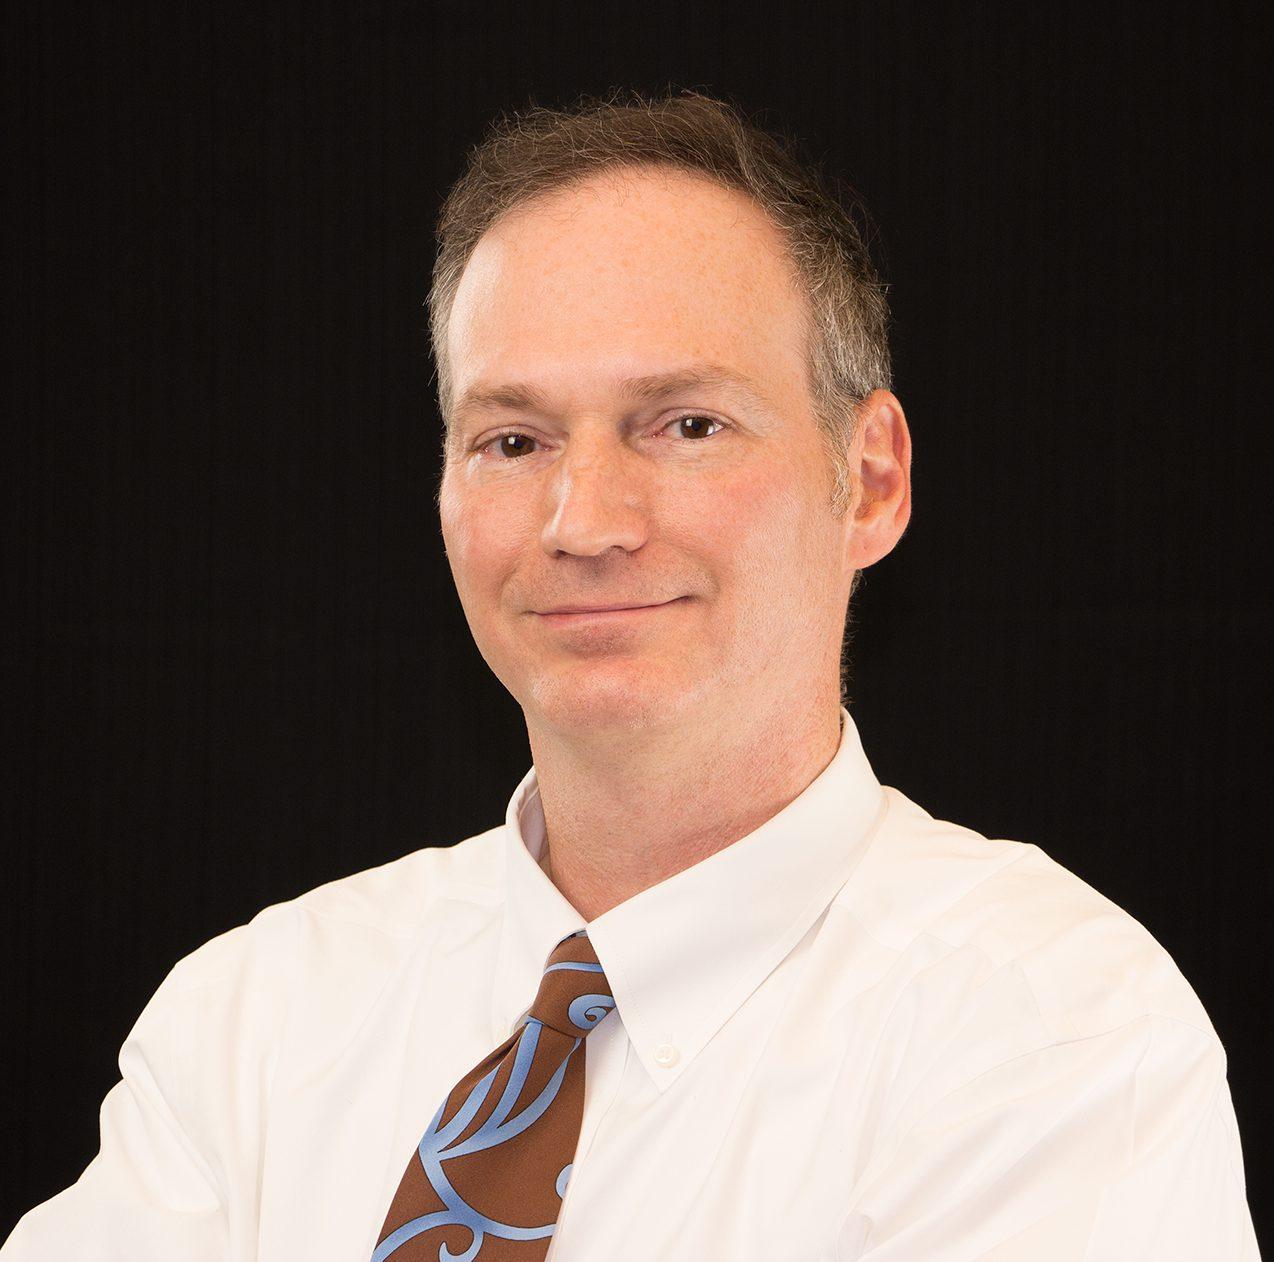 Chris Kretz